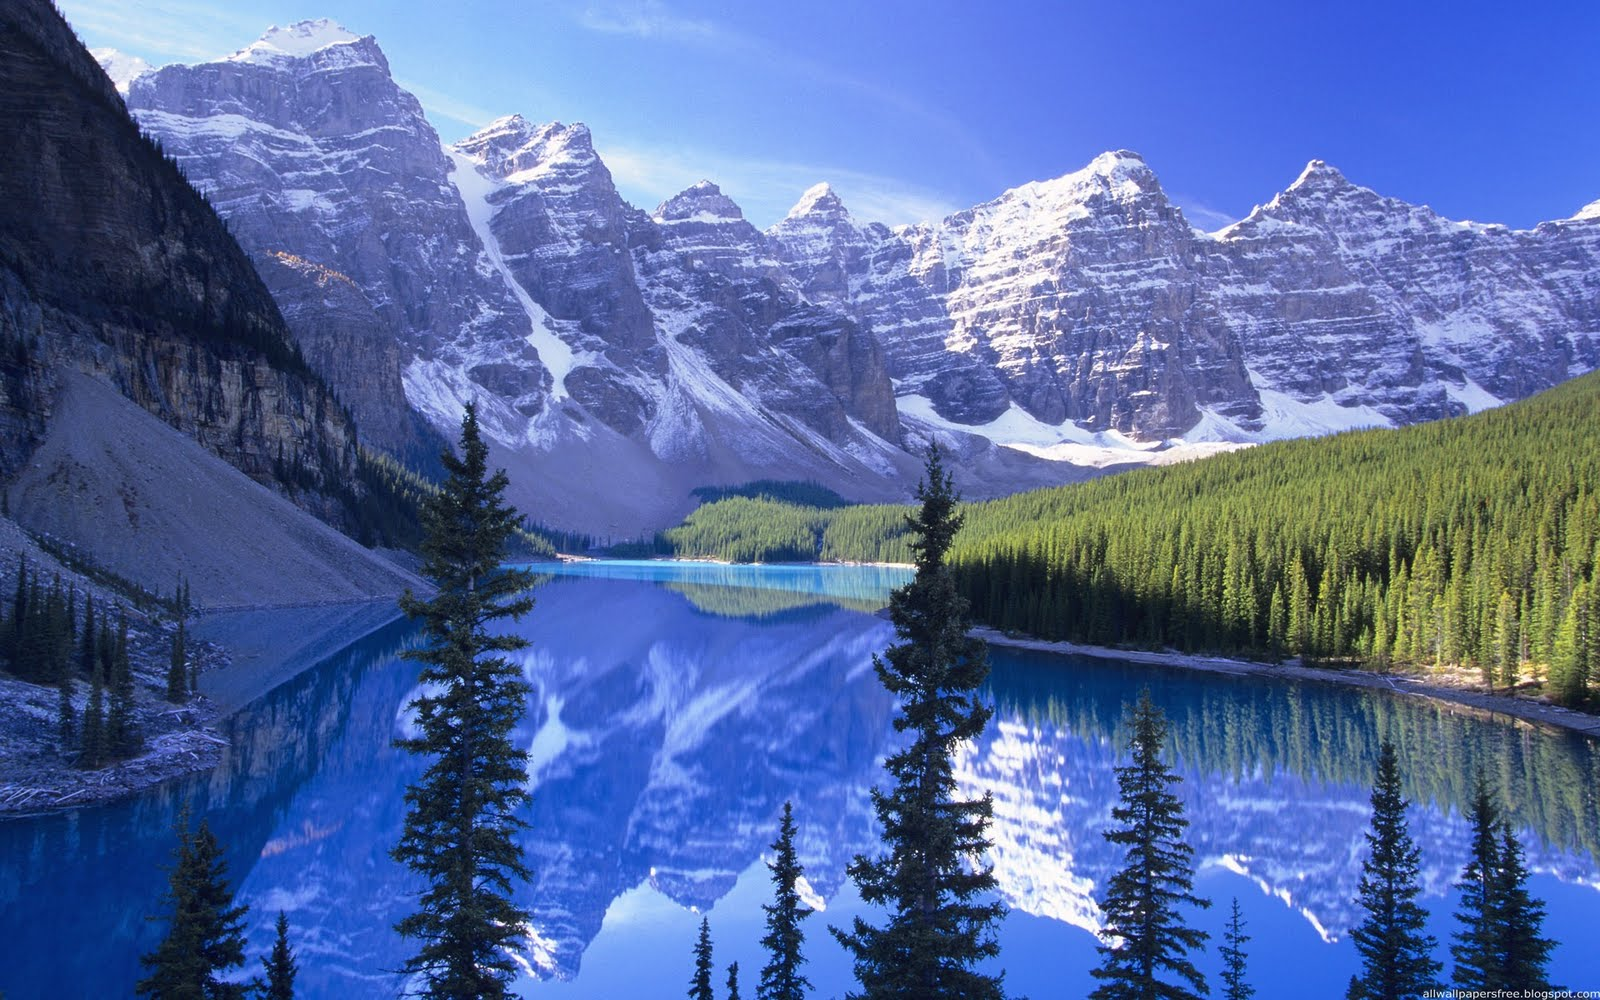 Wonderful Wallpaper Mountain Windows 7 - 71  Gallery_169663.jpg